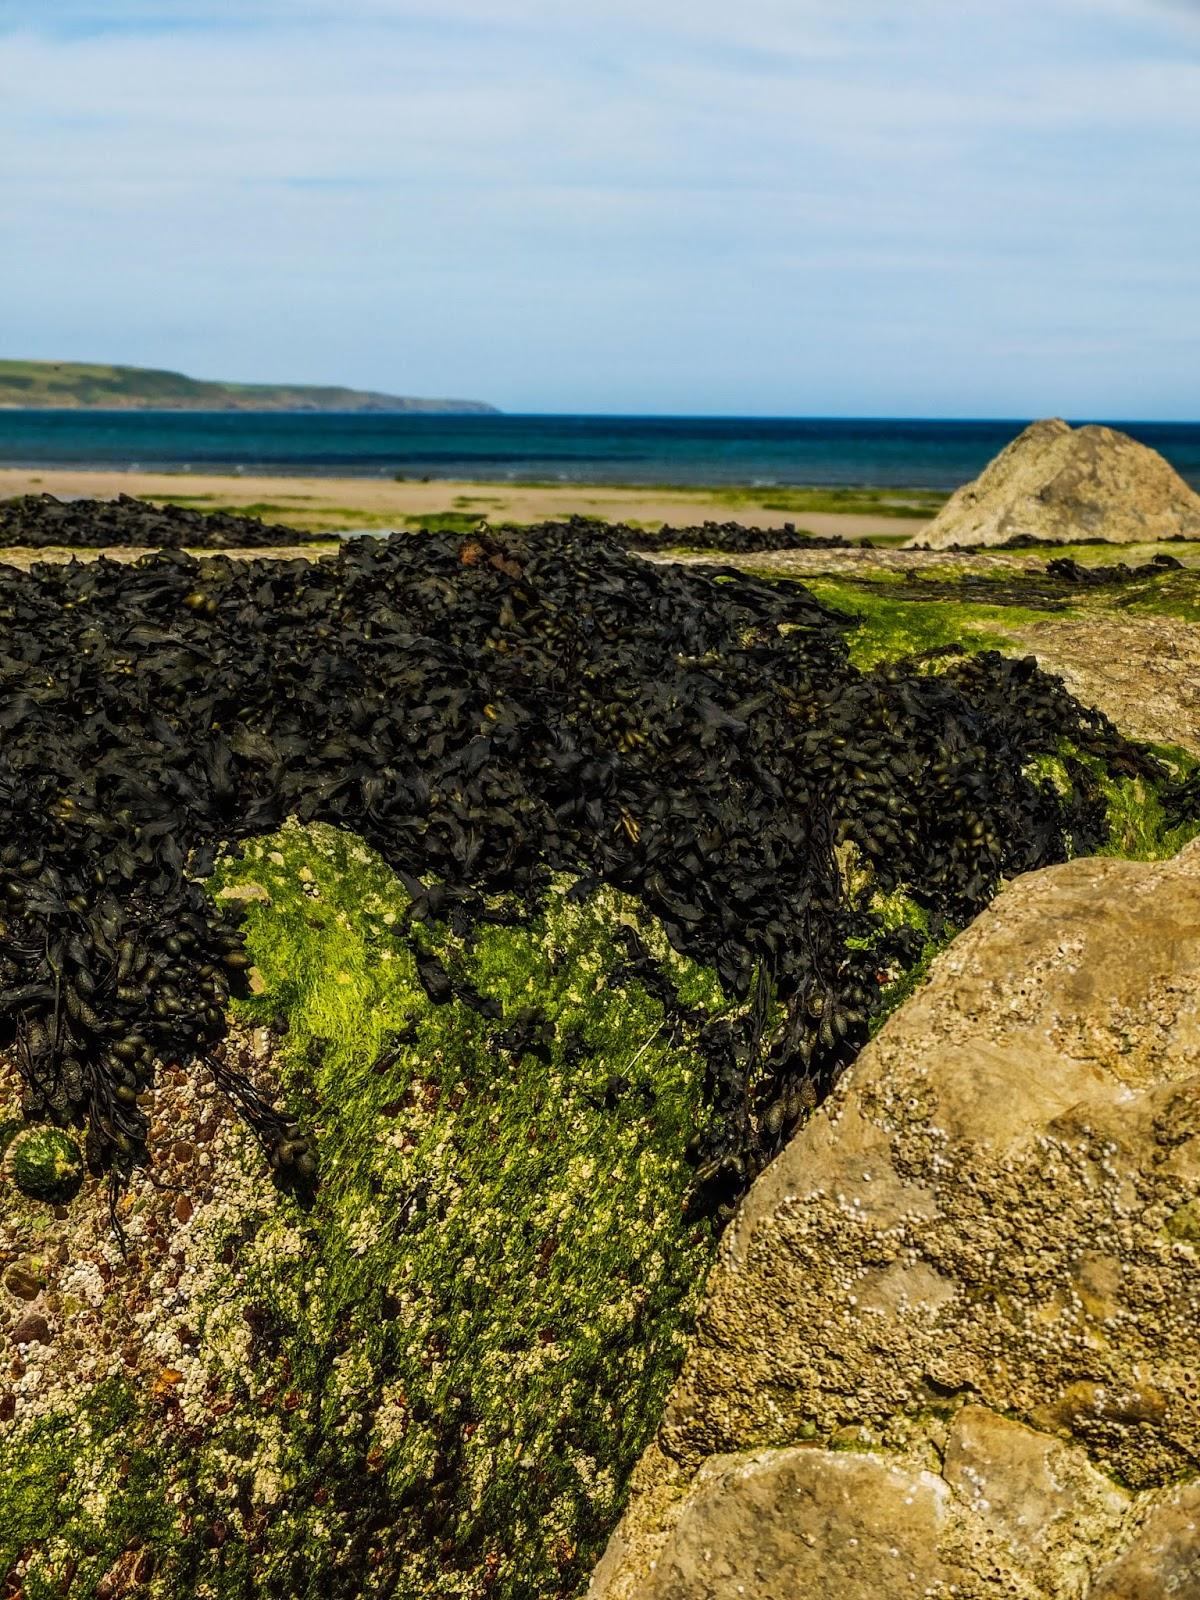 Seaweed growing on rocks on Garryvoe beach, Co.Cork.